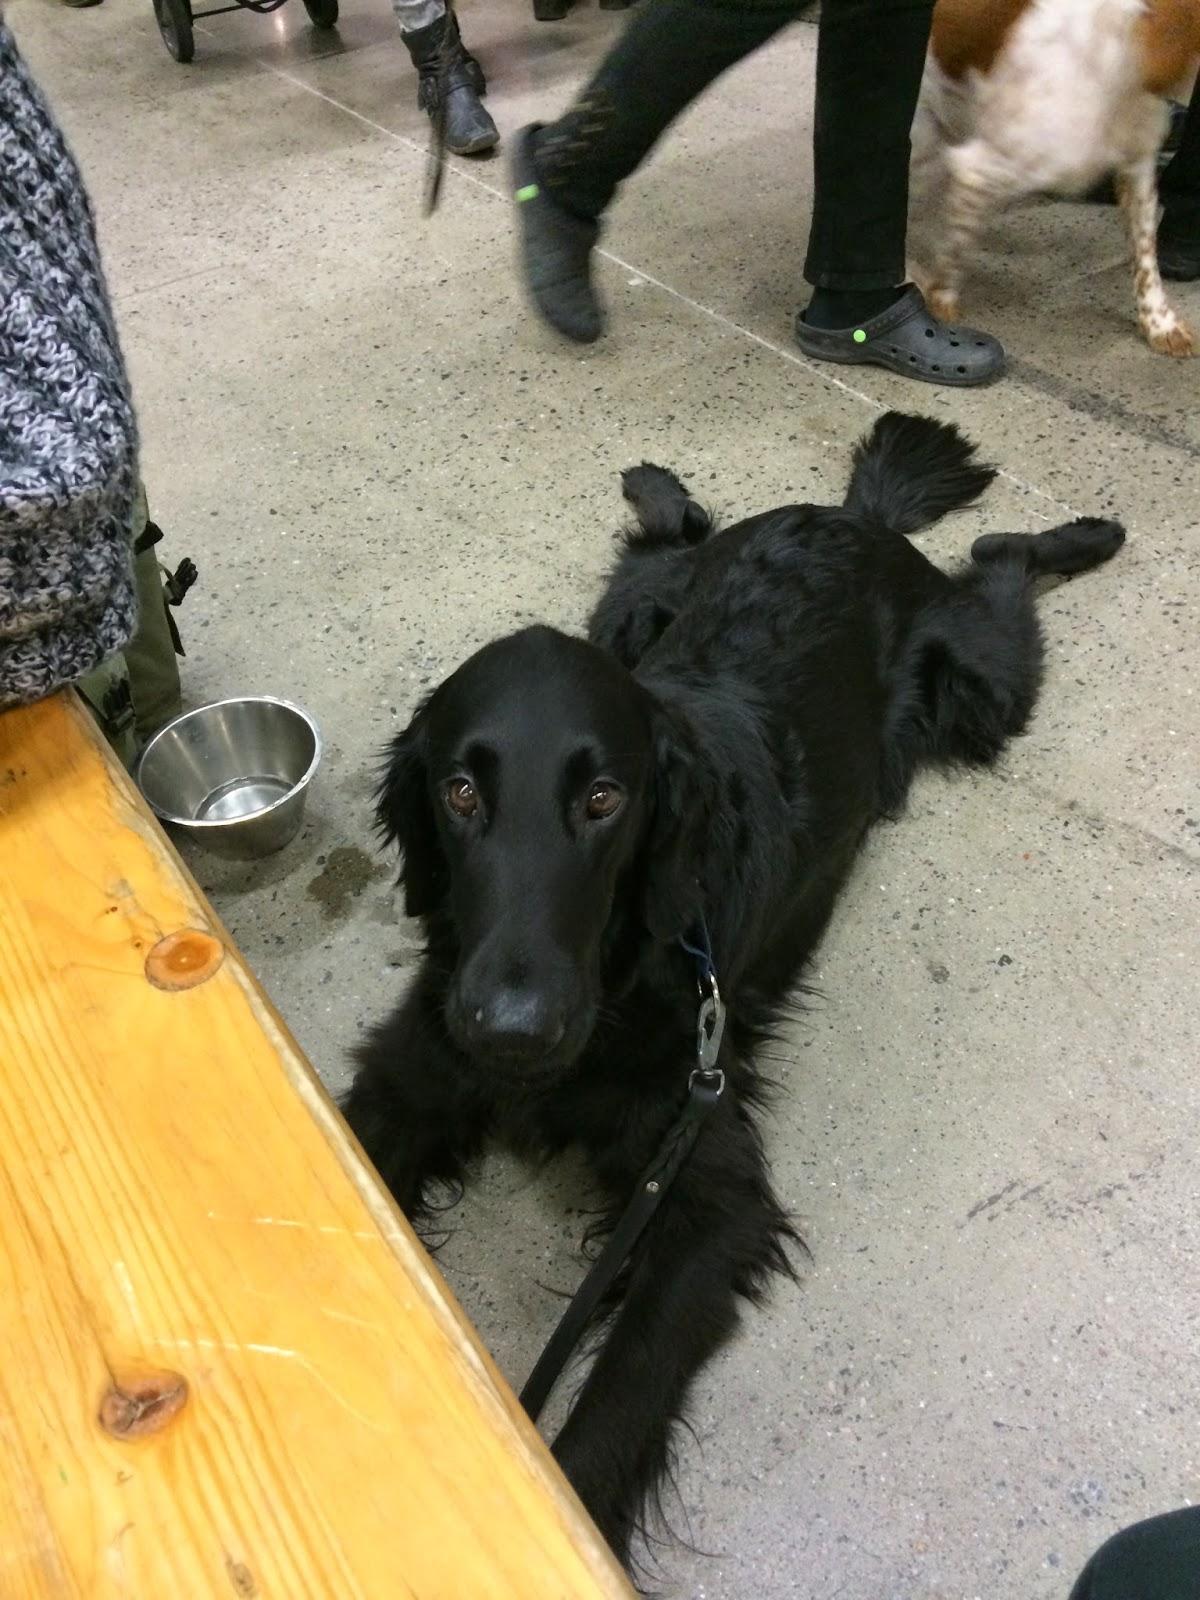 Ny bok avslojar 15 kandisars hundliv